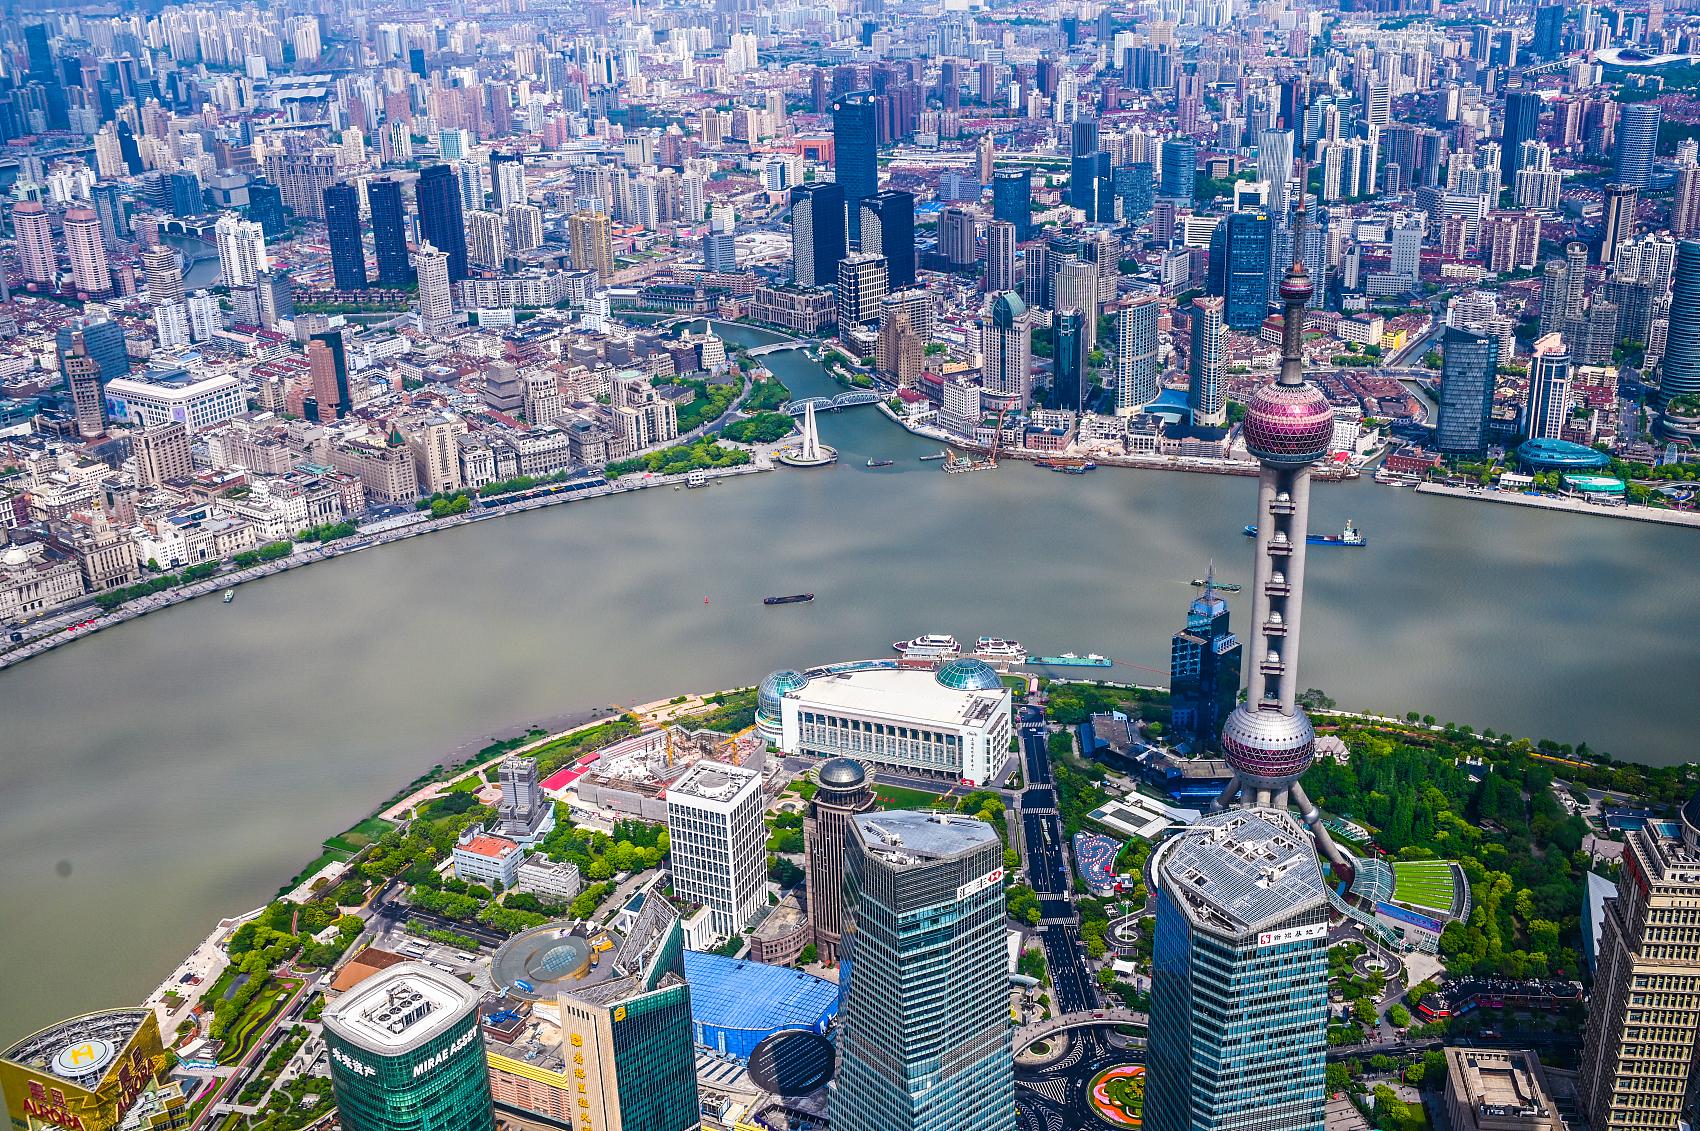 VCG111235196645觀眾在上海中華藝術宮觀看浦東開發開放30周年藝術展。.jpg